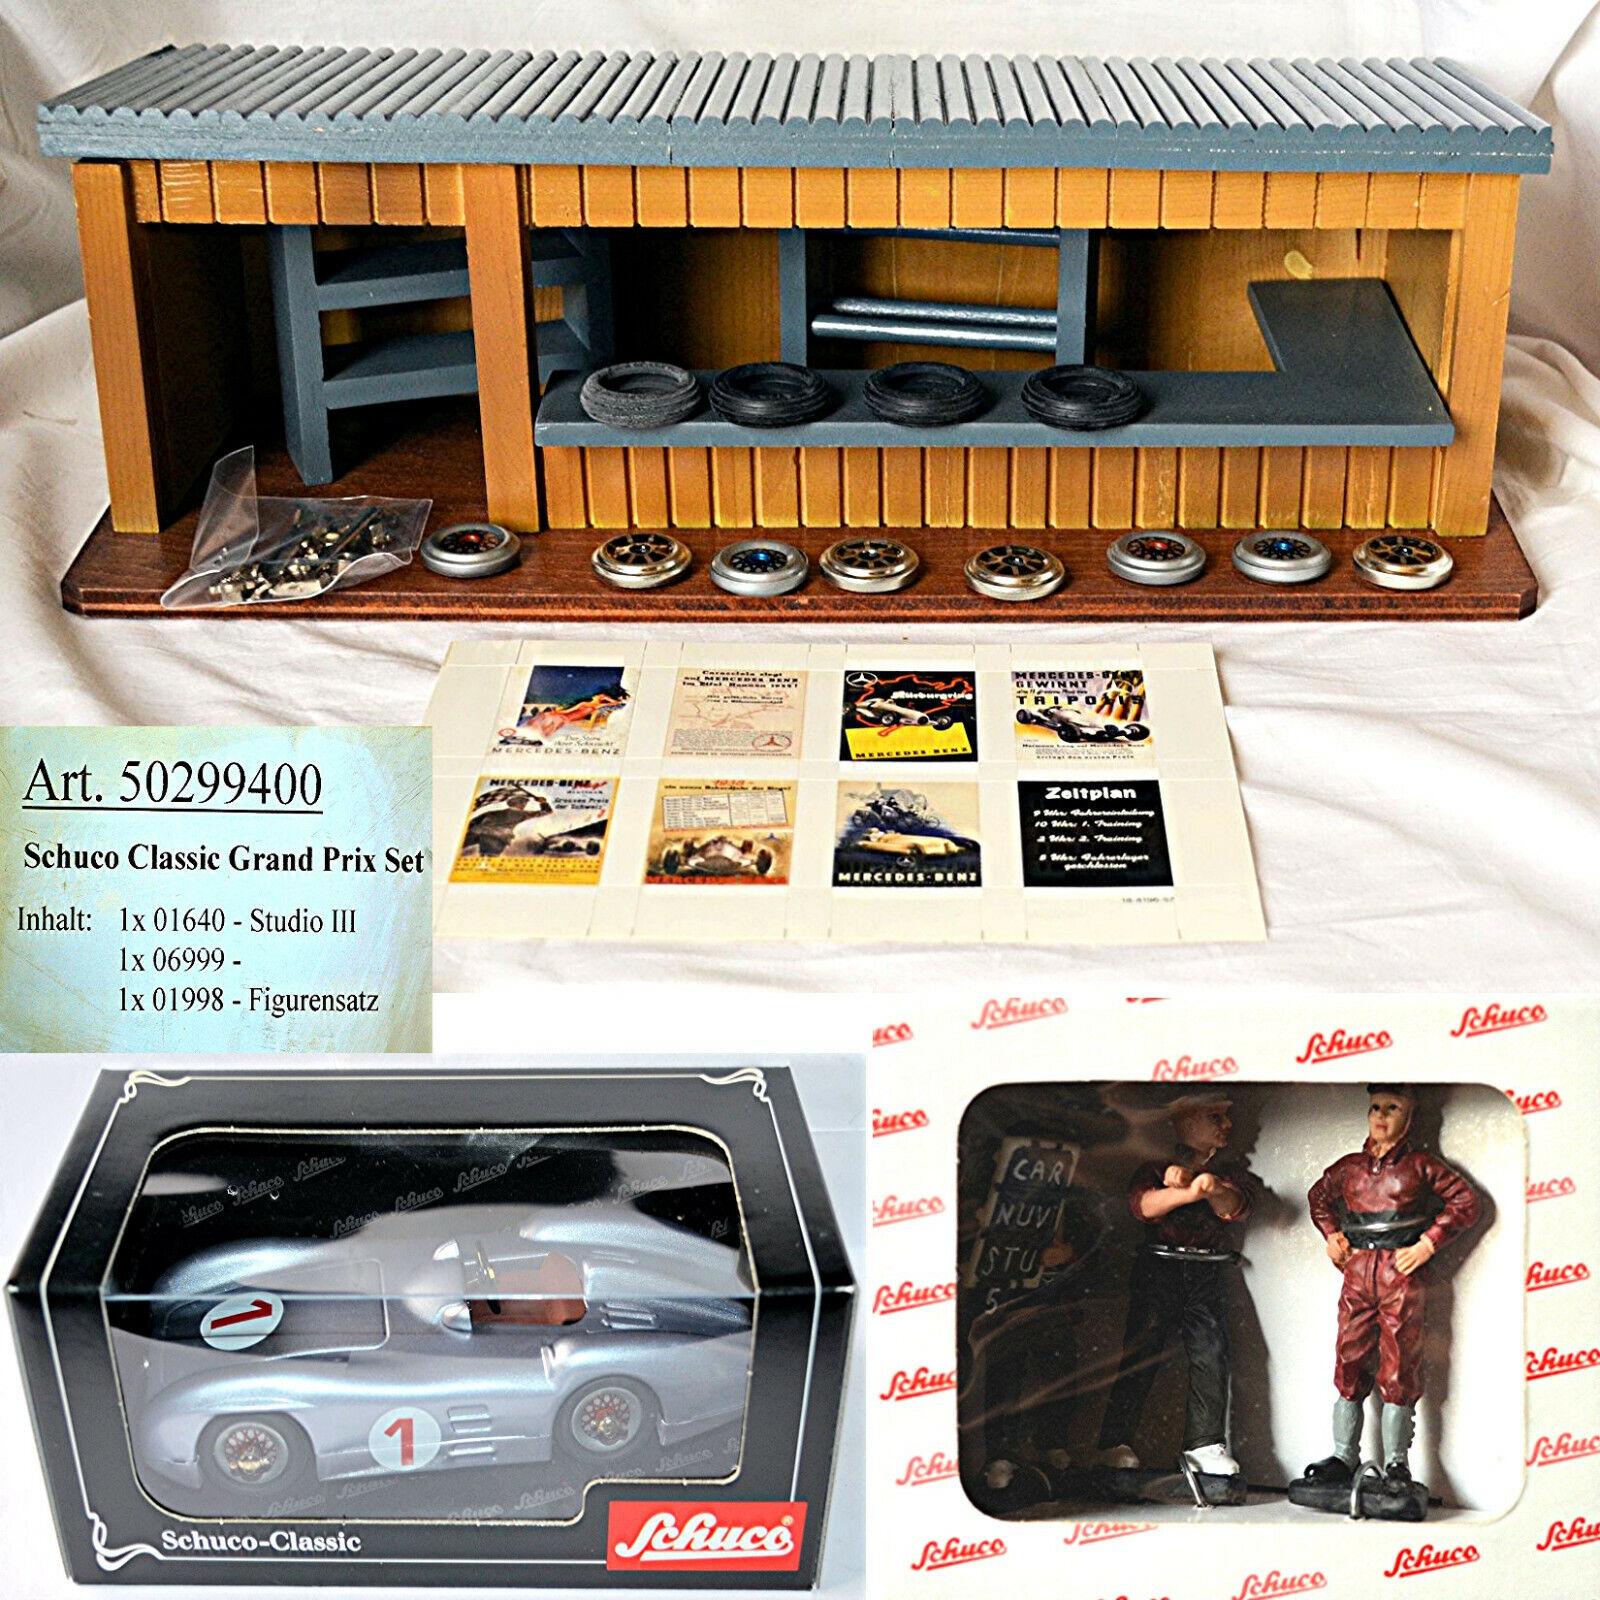 Schuco 50299400 CLASSIC GRAND PRIX SET = Studio 3 Mo w196 Figurenset Boxe ruelle